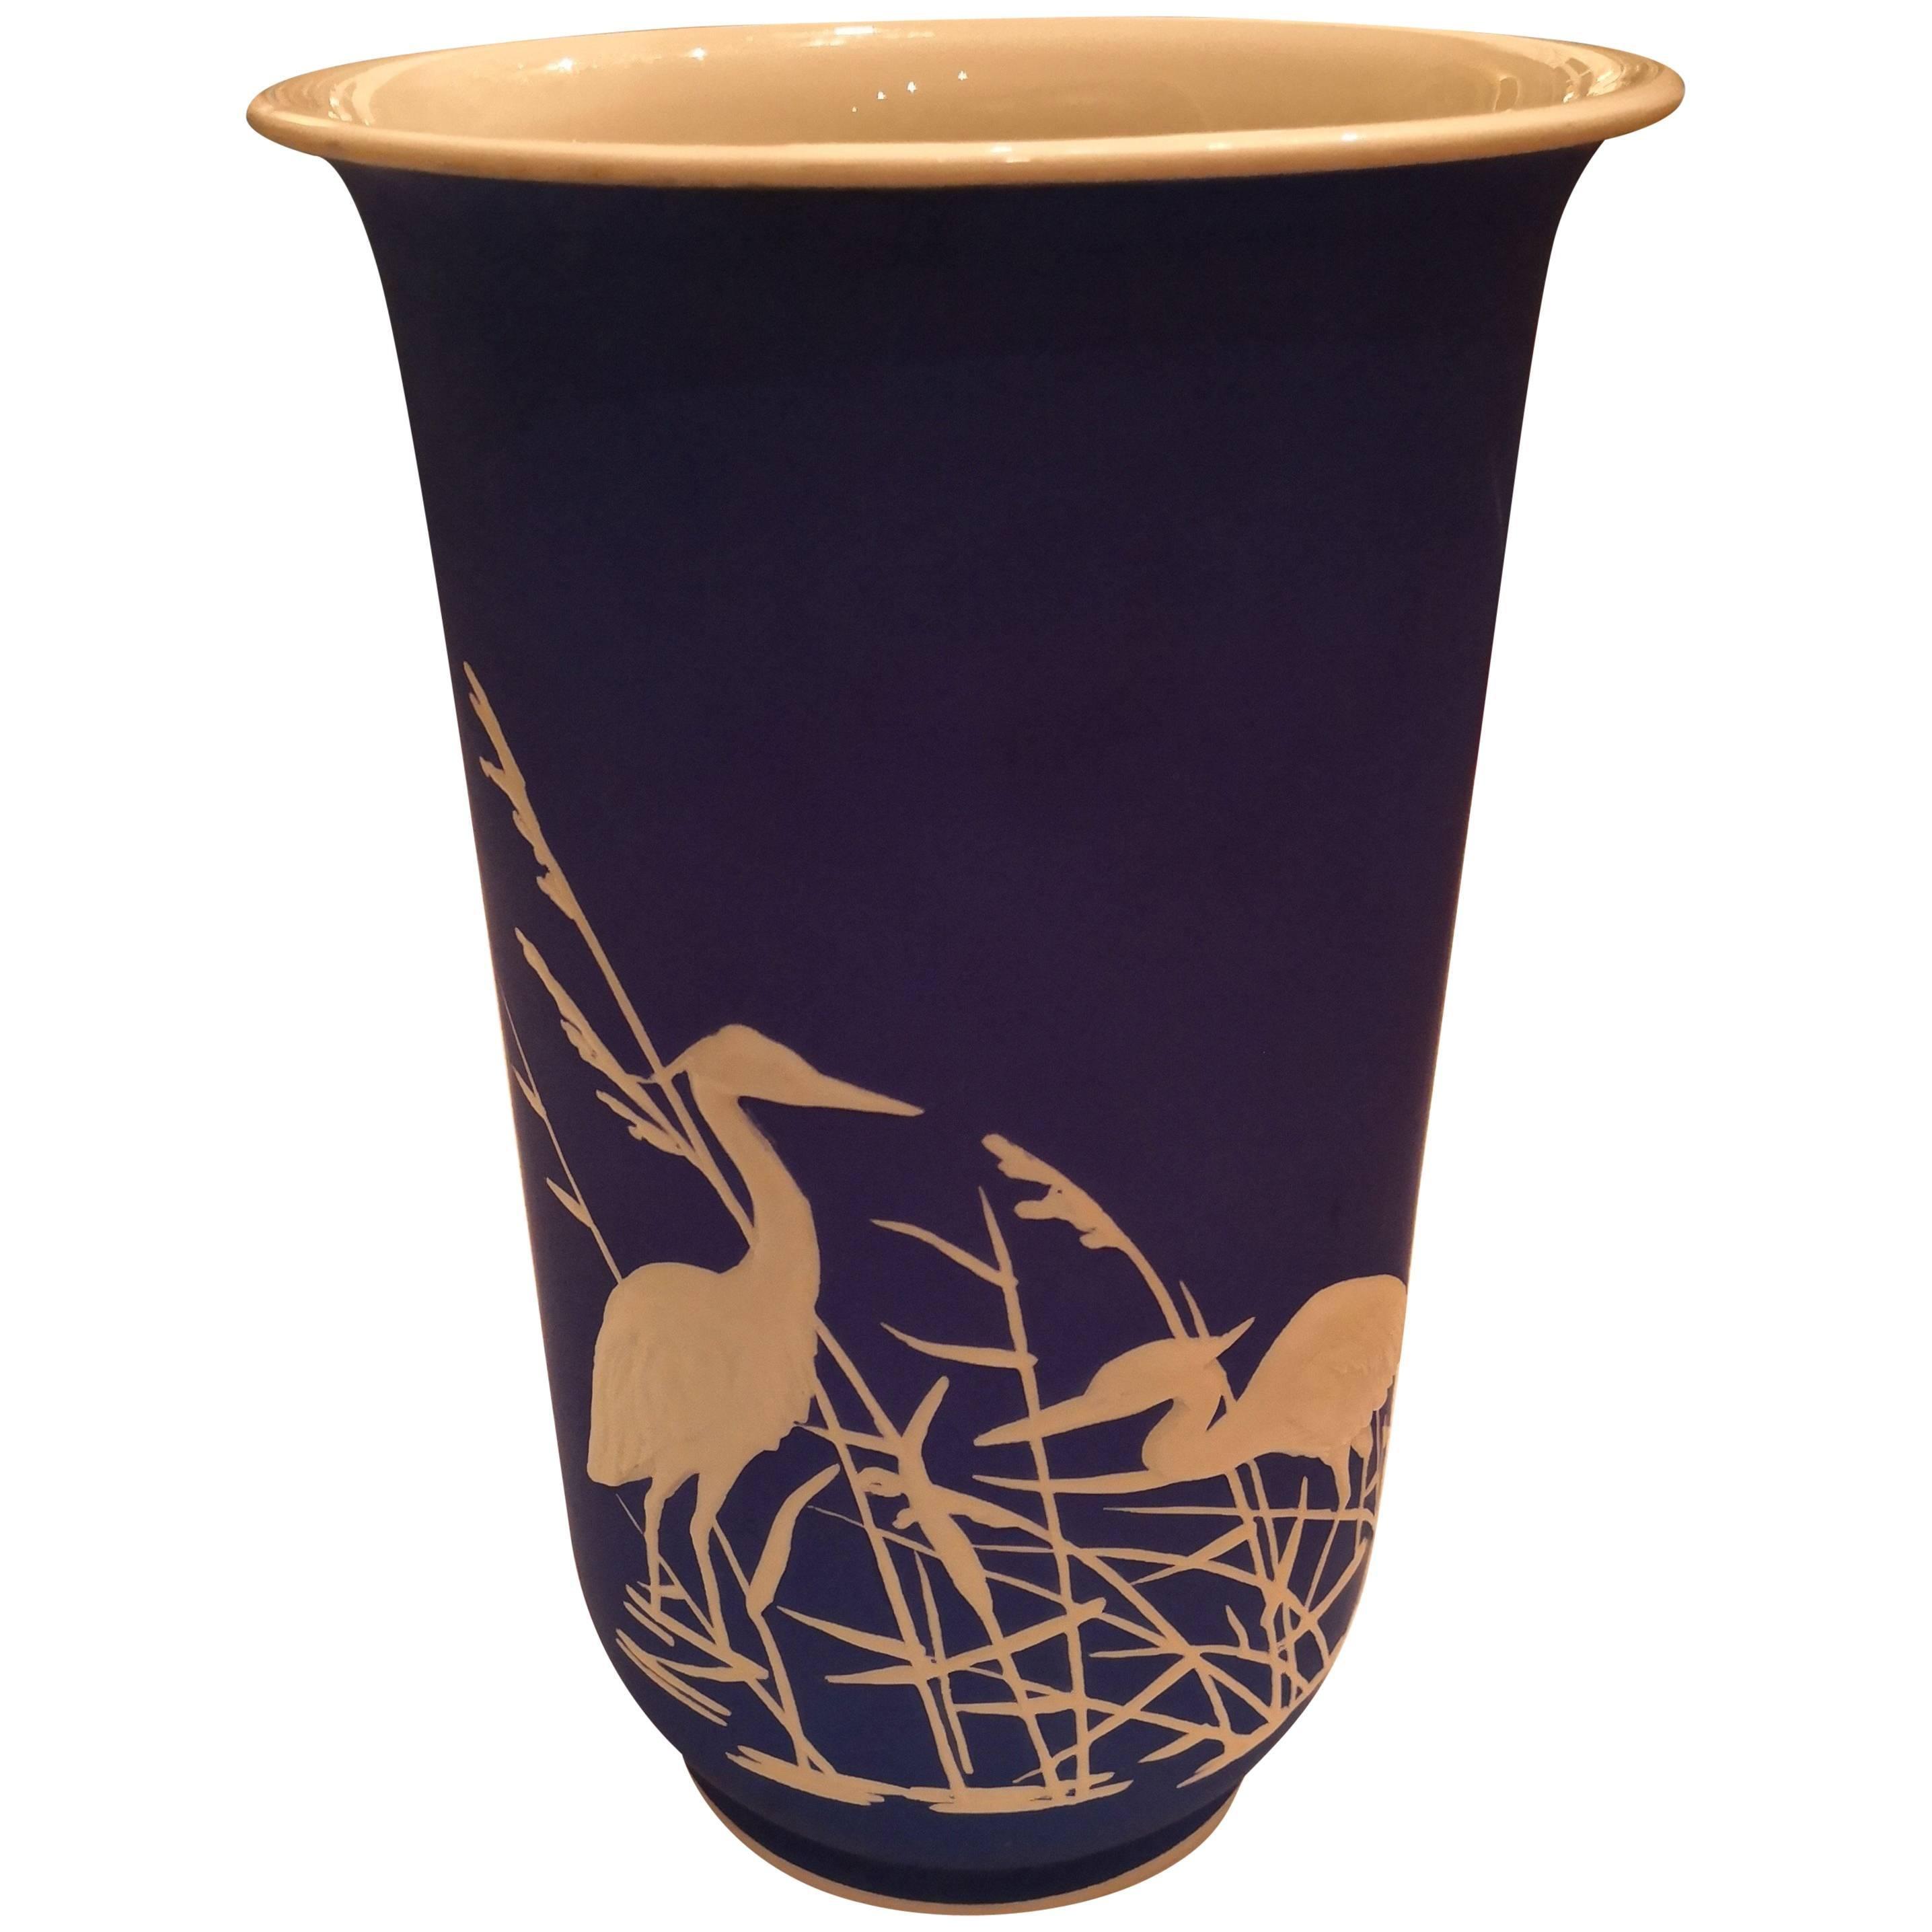 Mid-Century Modern German Rosenthal Porcelain Vase in Blue